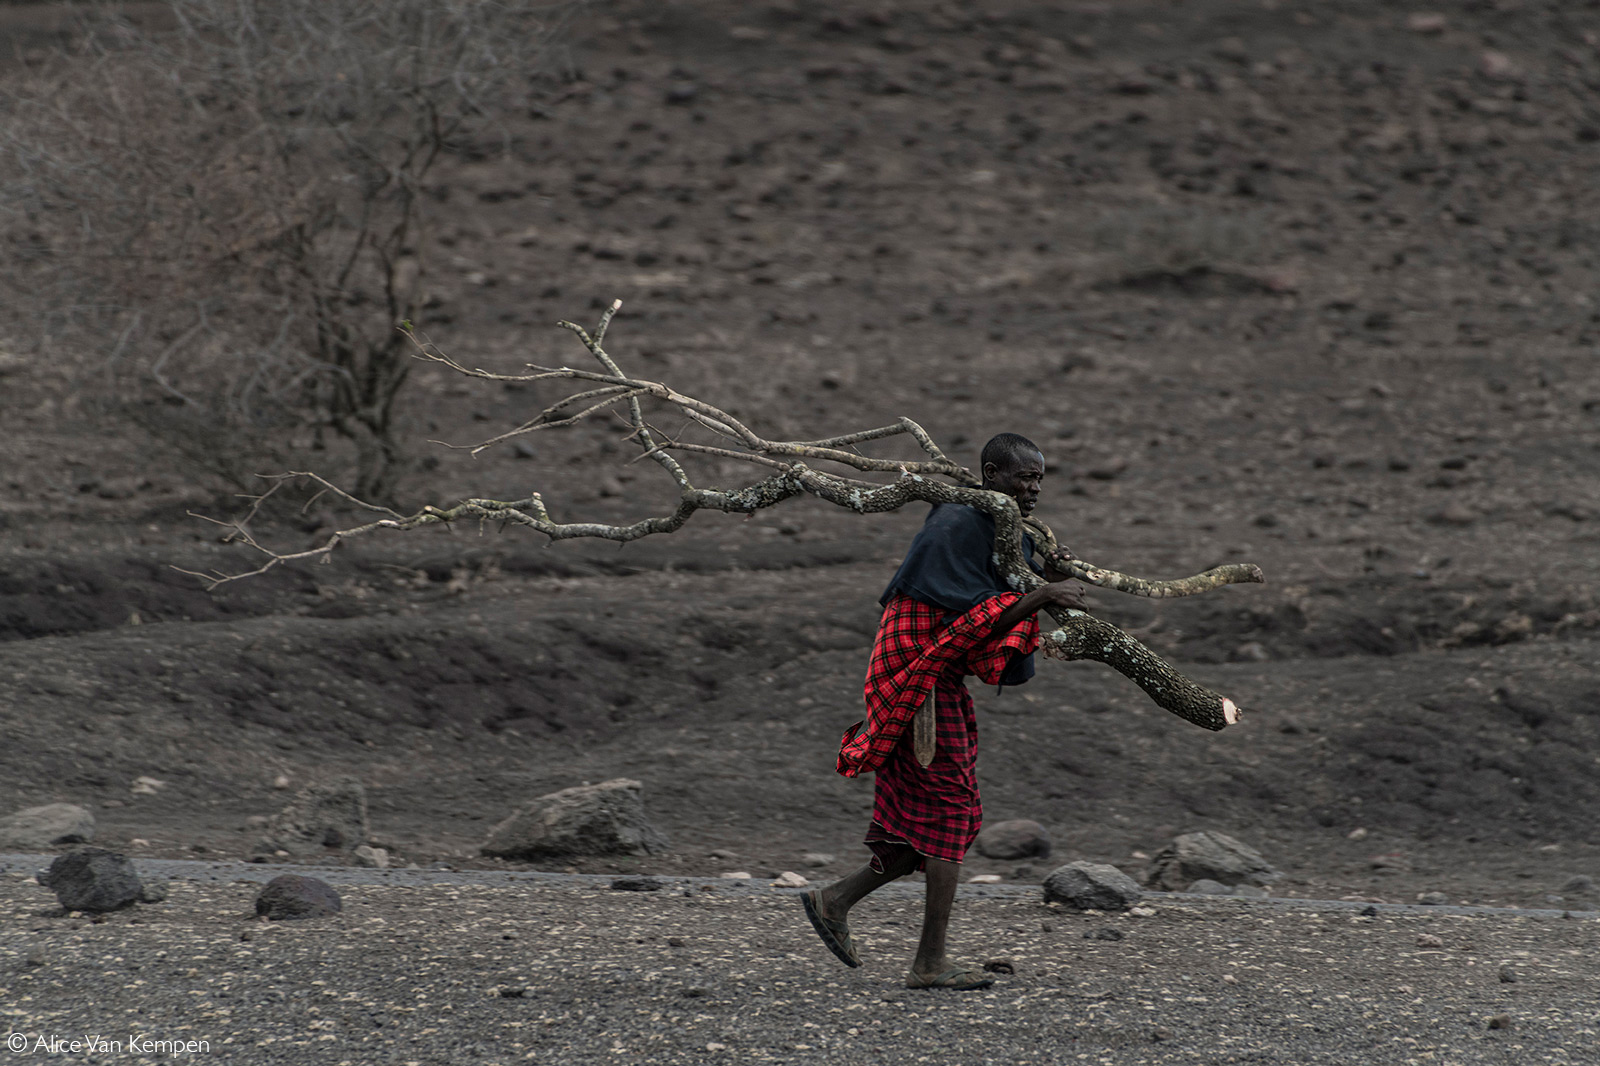 Maasai man gathering wood in a desolate landscape, near Serengeti National Park, Tanzania © Alice van Kempen